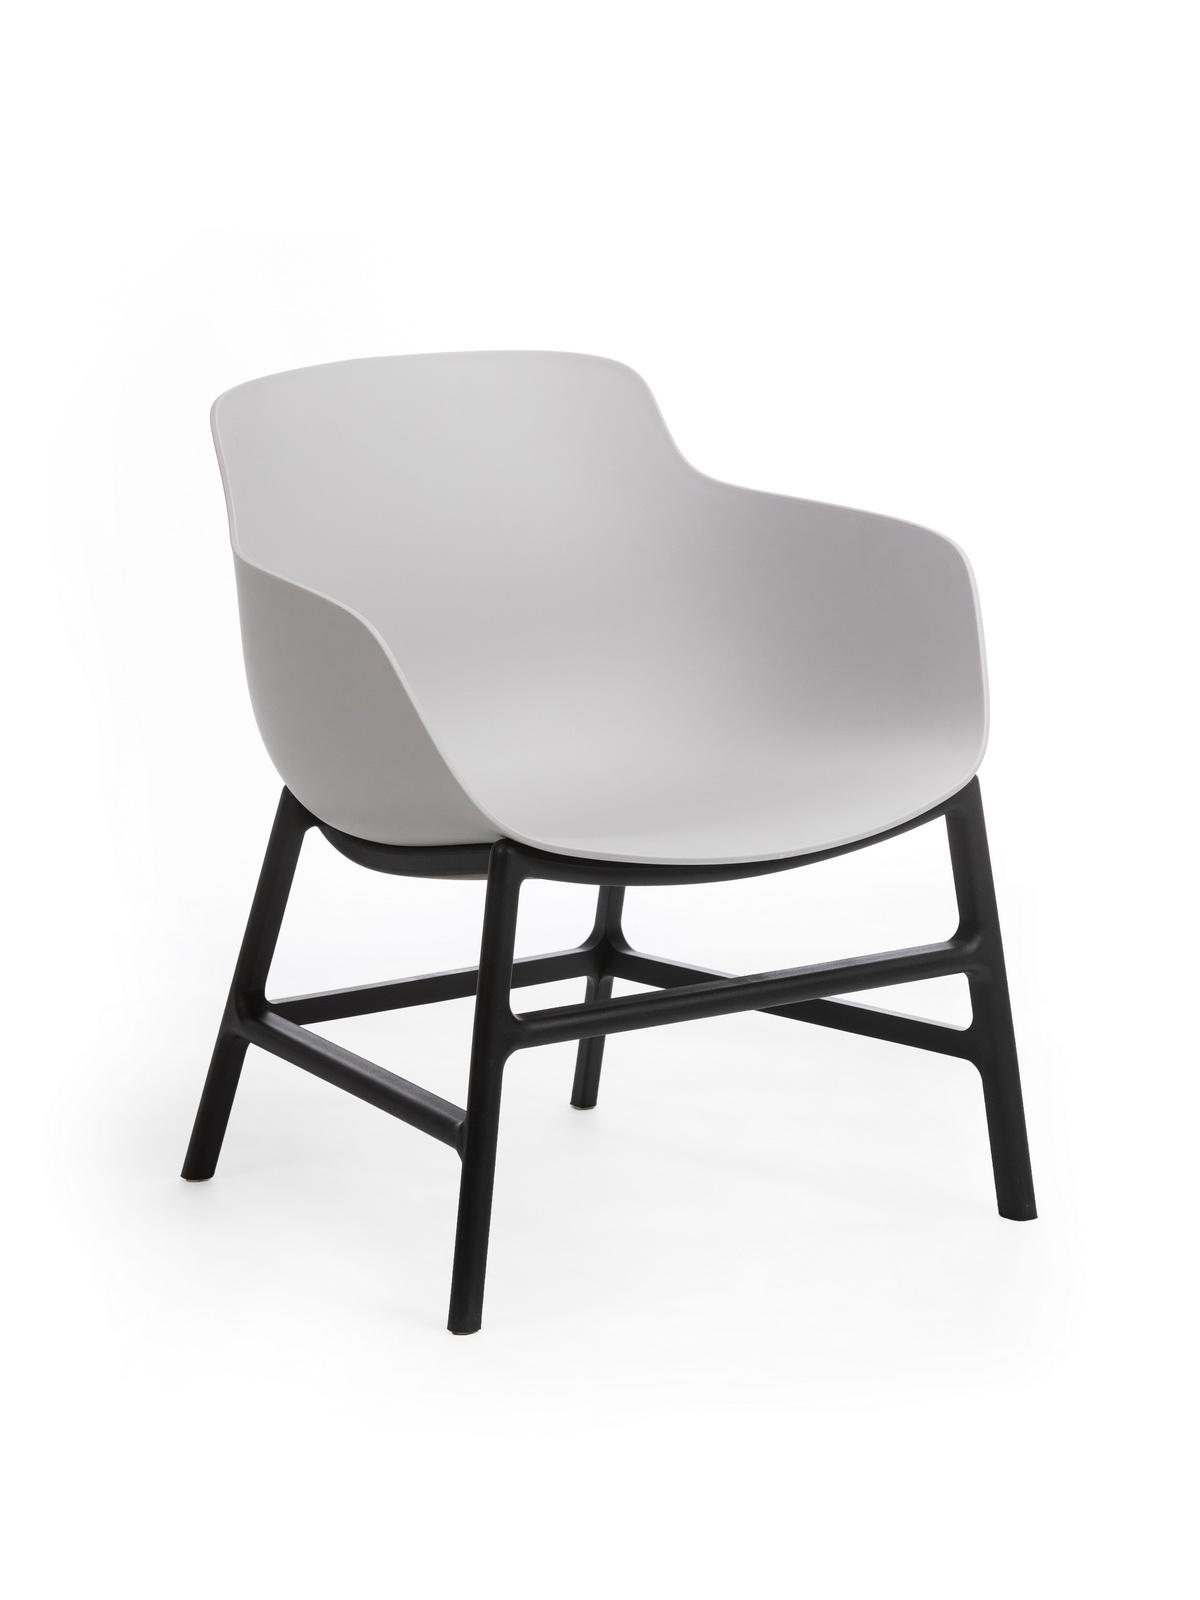 Scaun din plastic, cu picioare metalice Ines Grey, l63xA62xH70cm